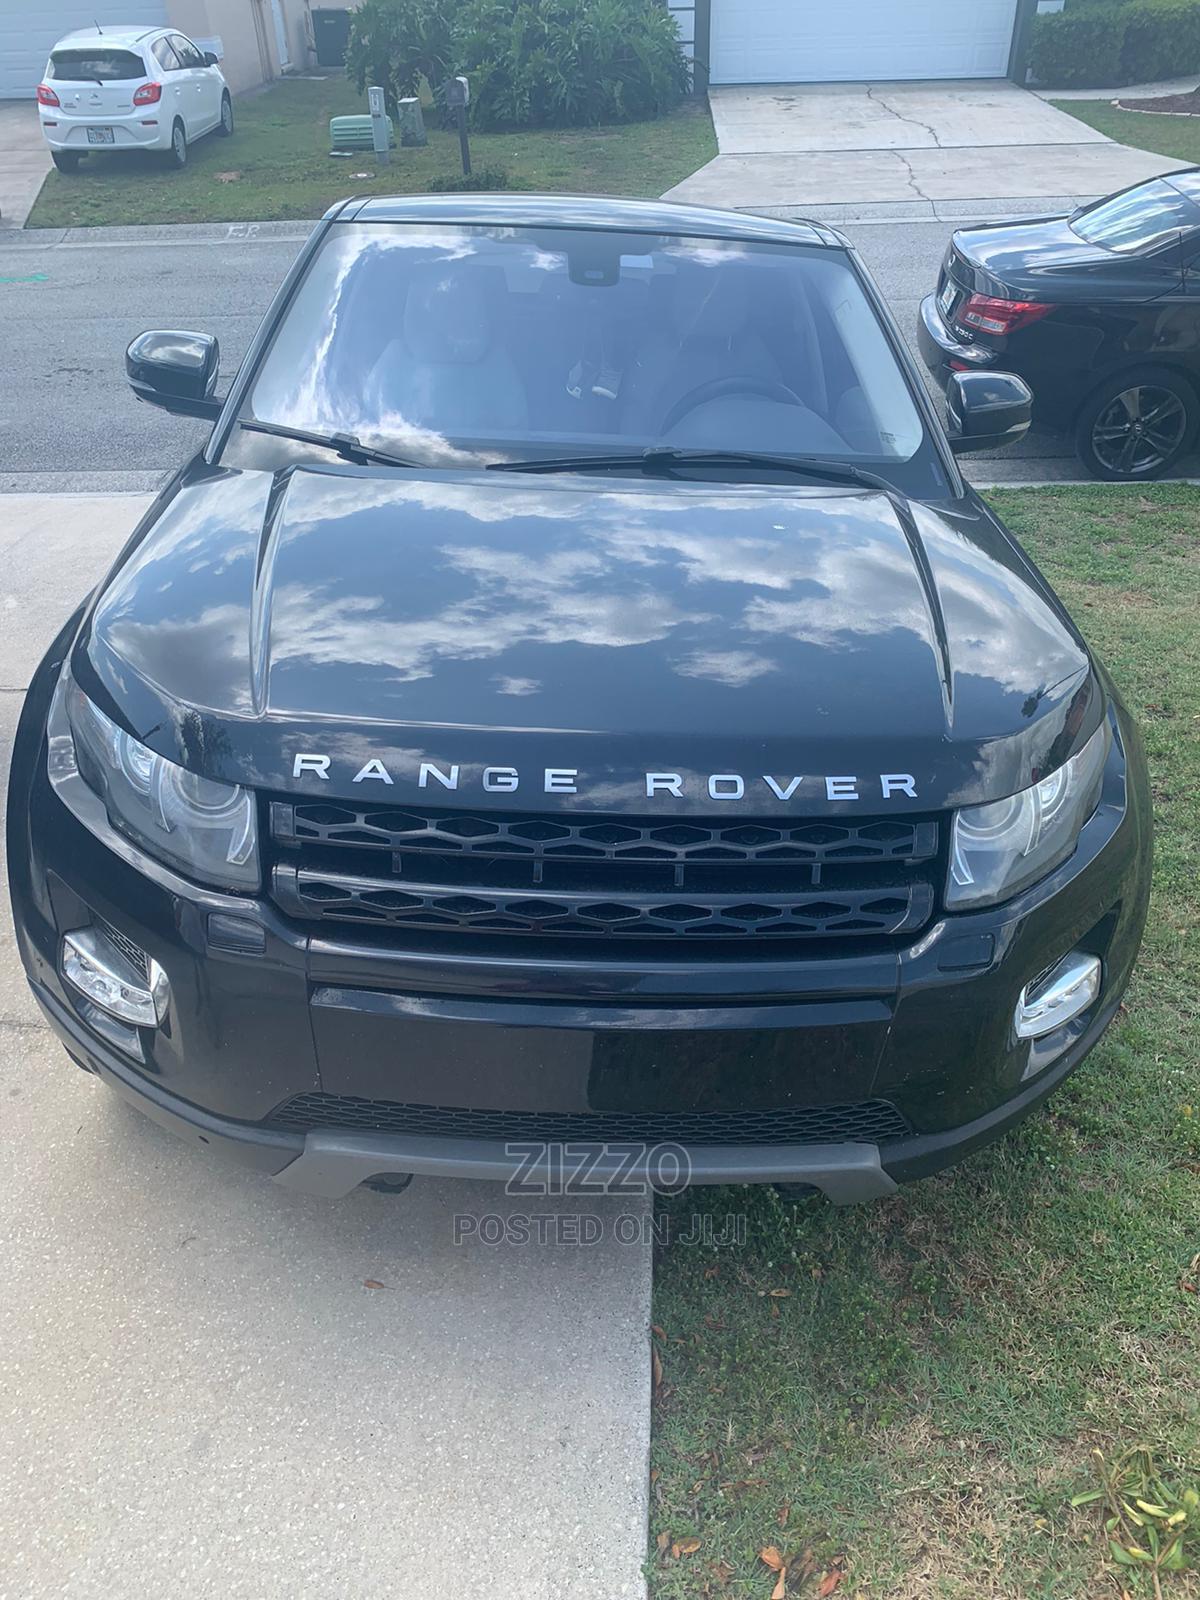 Archive: Land Rover Range Rover Evoque 2012 Black